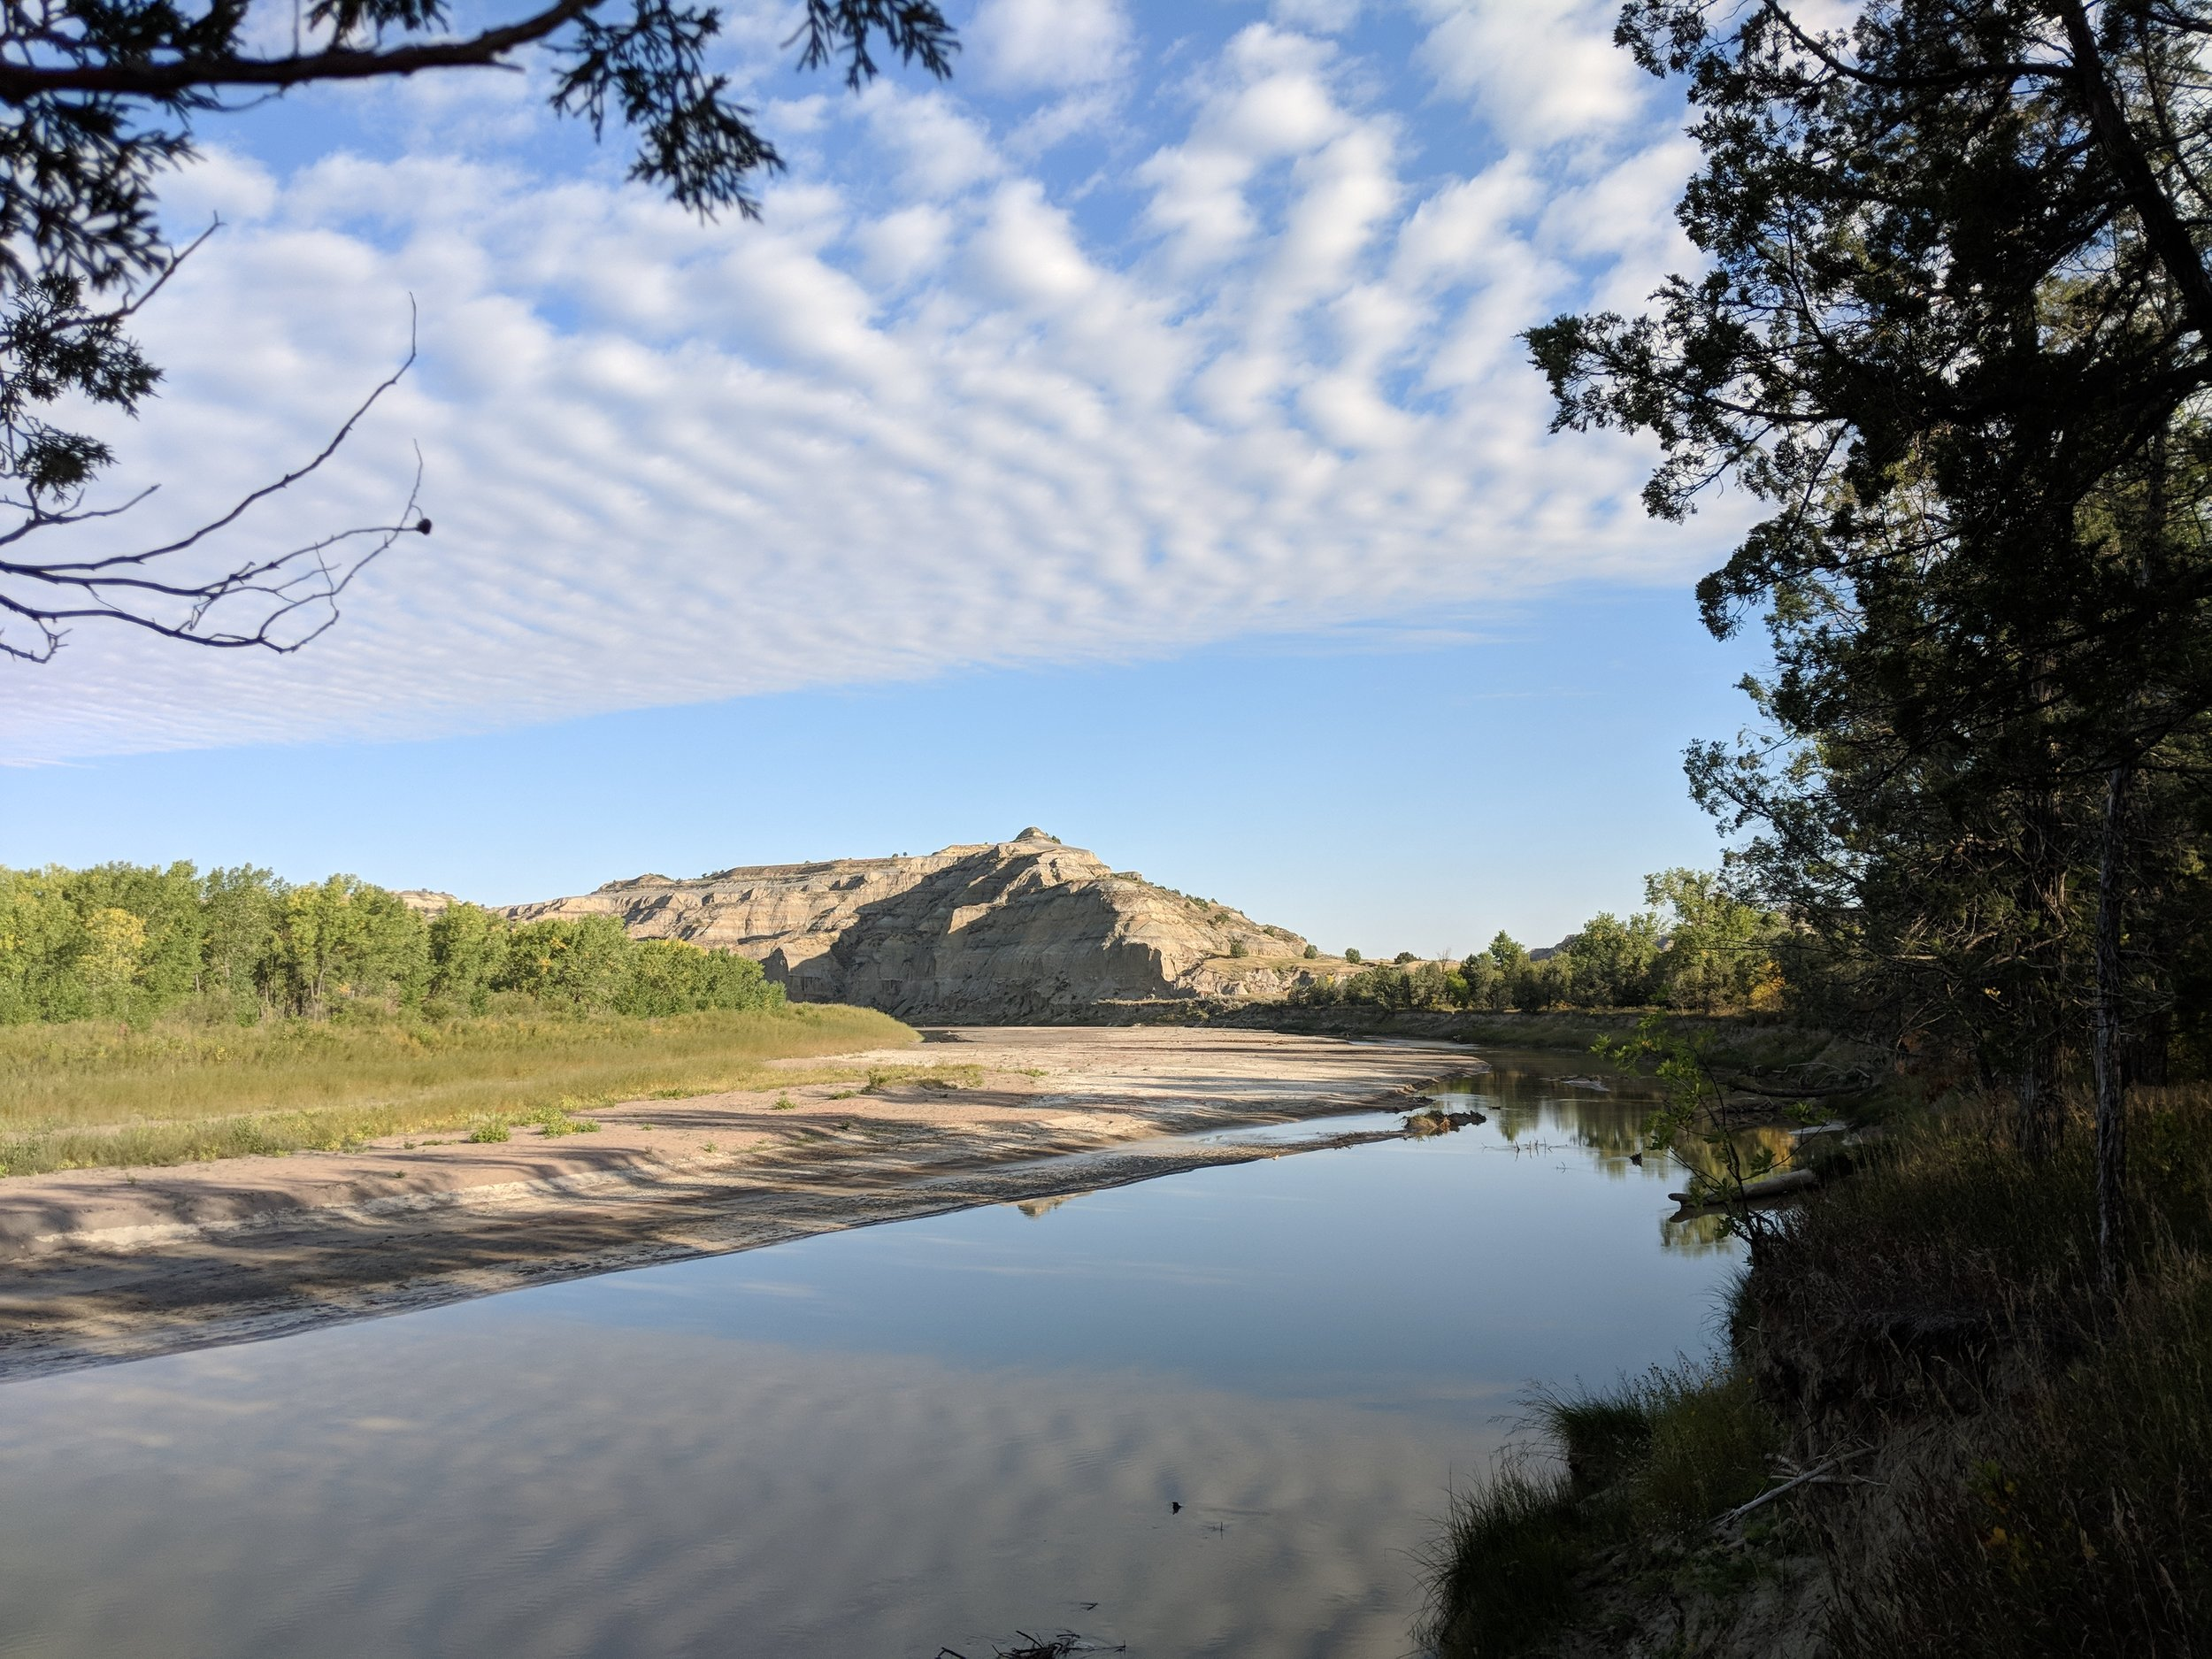 Little Missouri River at Dawn by Lillian Crook